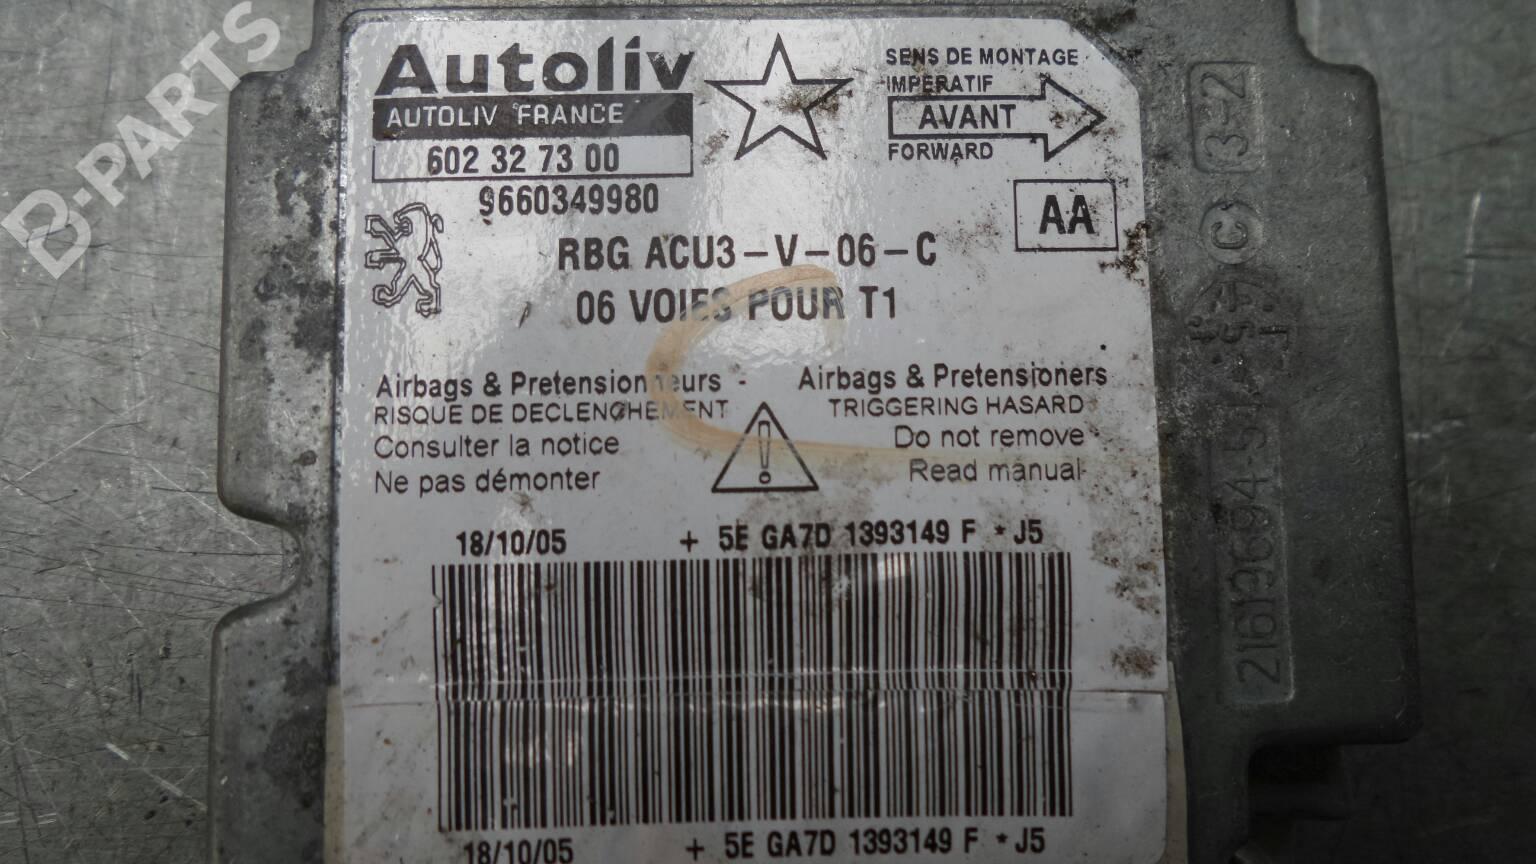 Airbags Ecu Peugeot 206 Hatchback 2a C 14 Hdi Eco 70 269045 J5 Fuse Box 9660349980